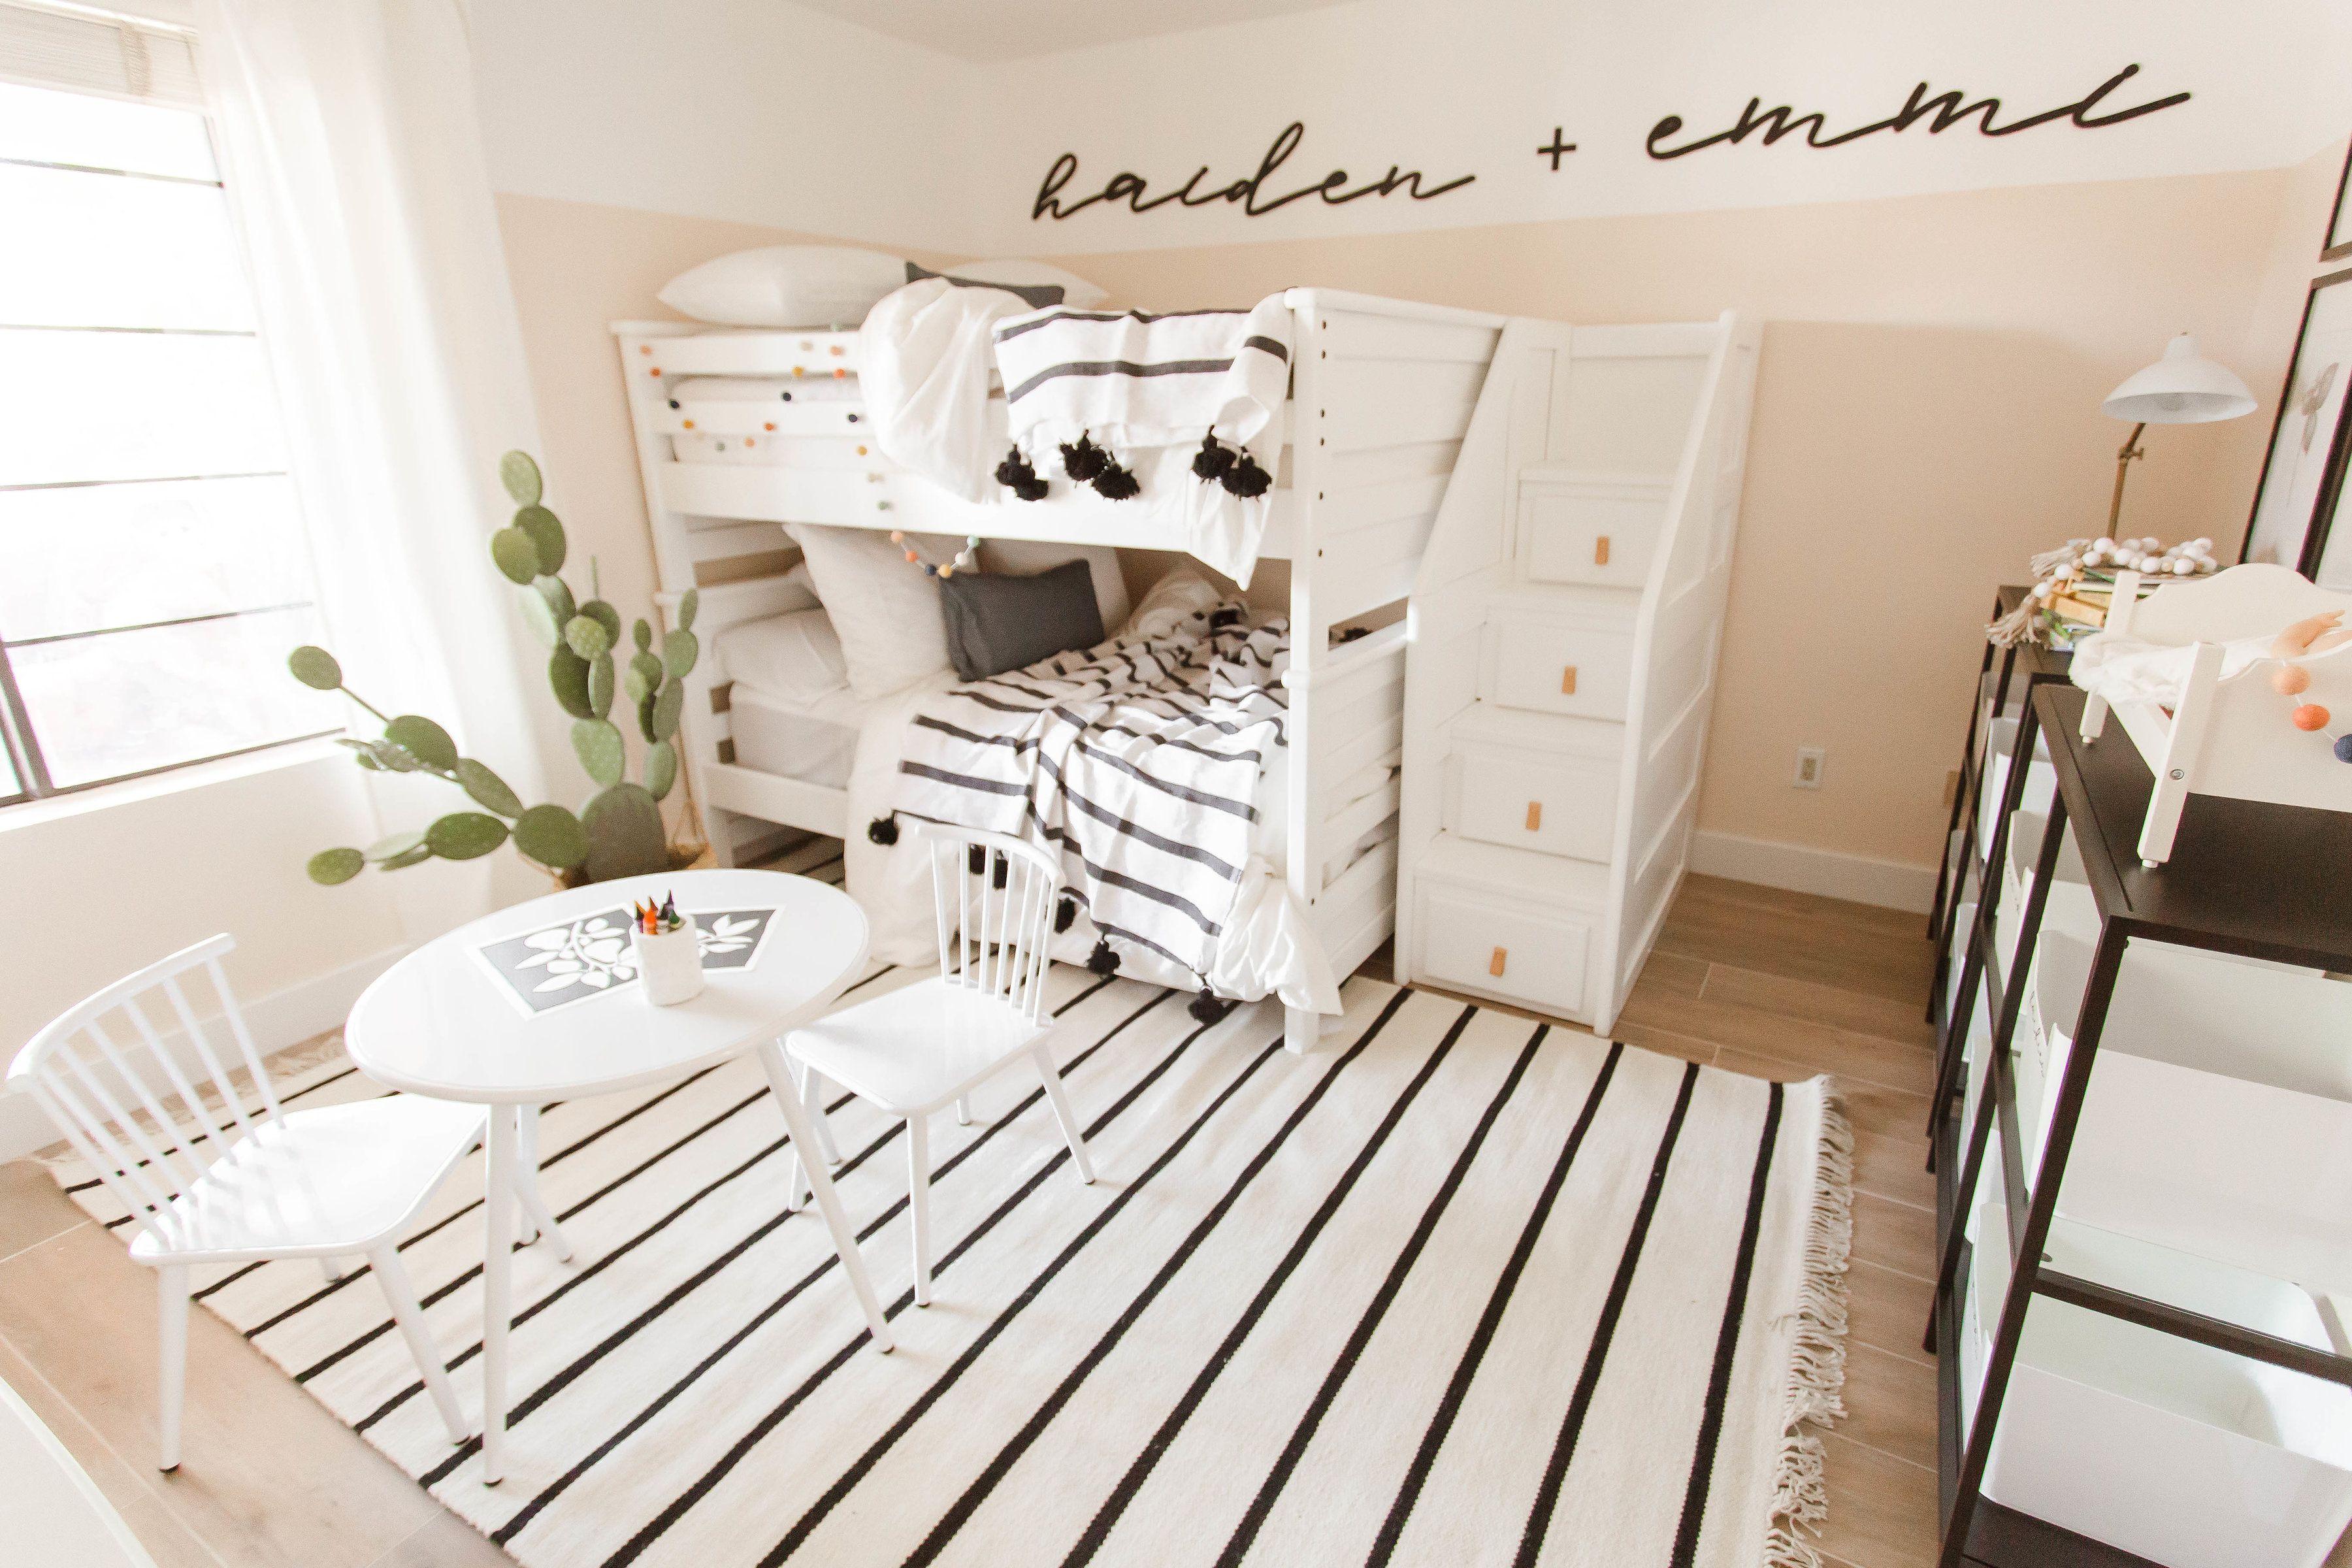 Casadeleeproject Bedroom Lead Designer Misskylieray Lifestyledco Photos Shannonleephotoaz